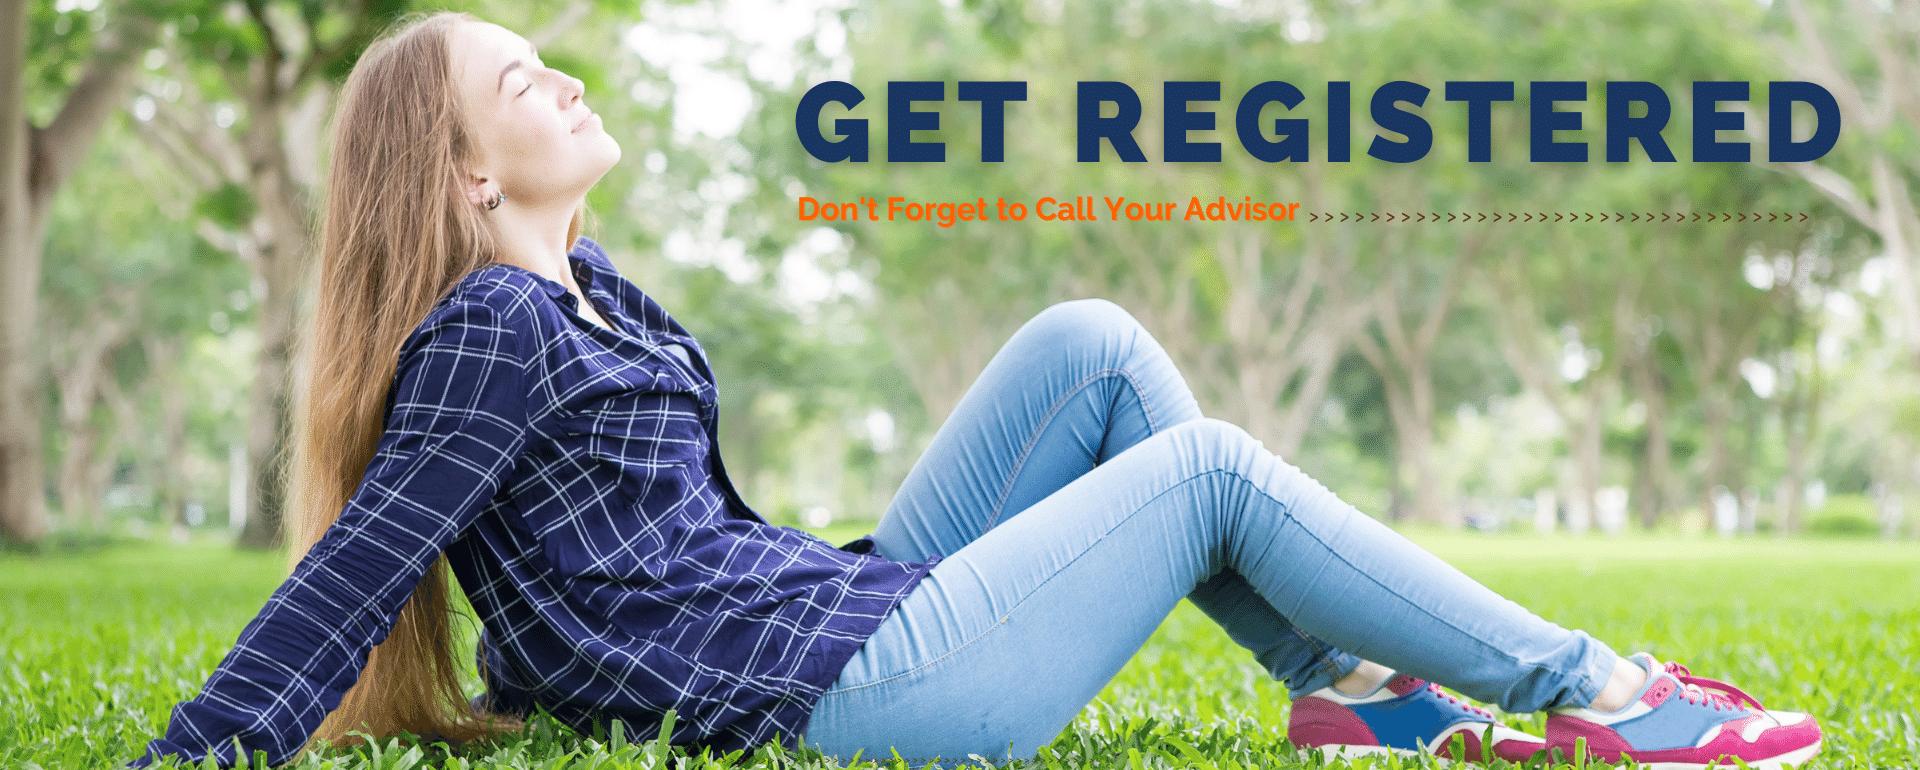 Get registered for fall